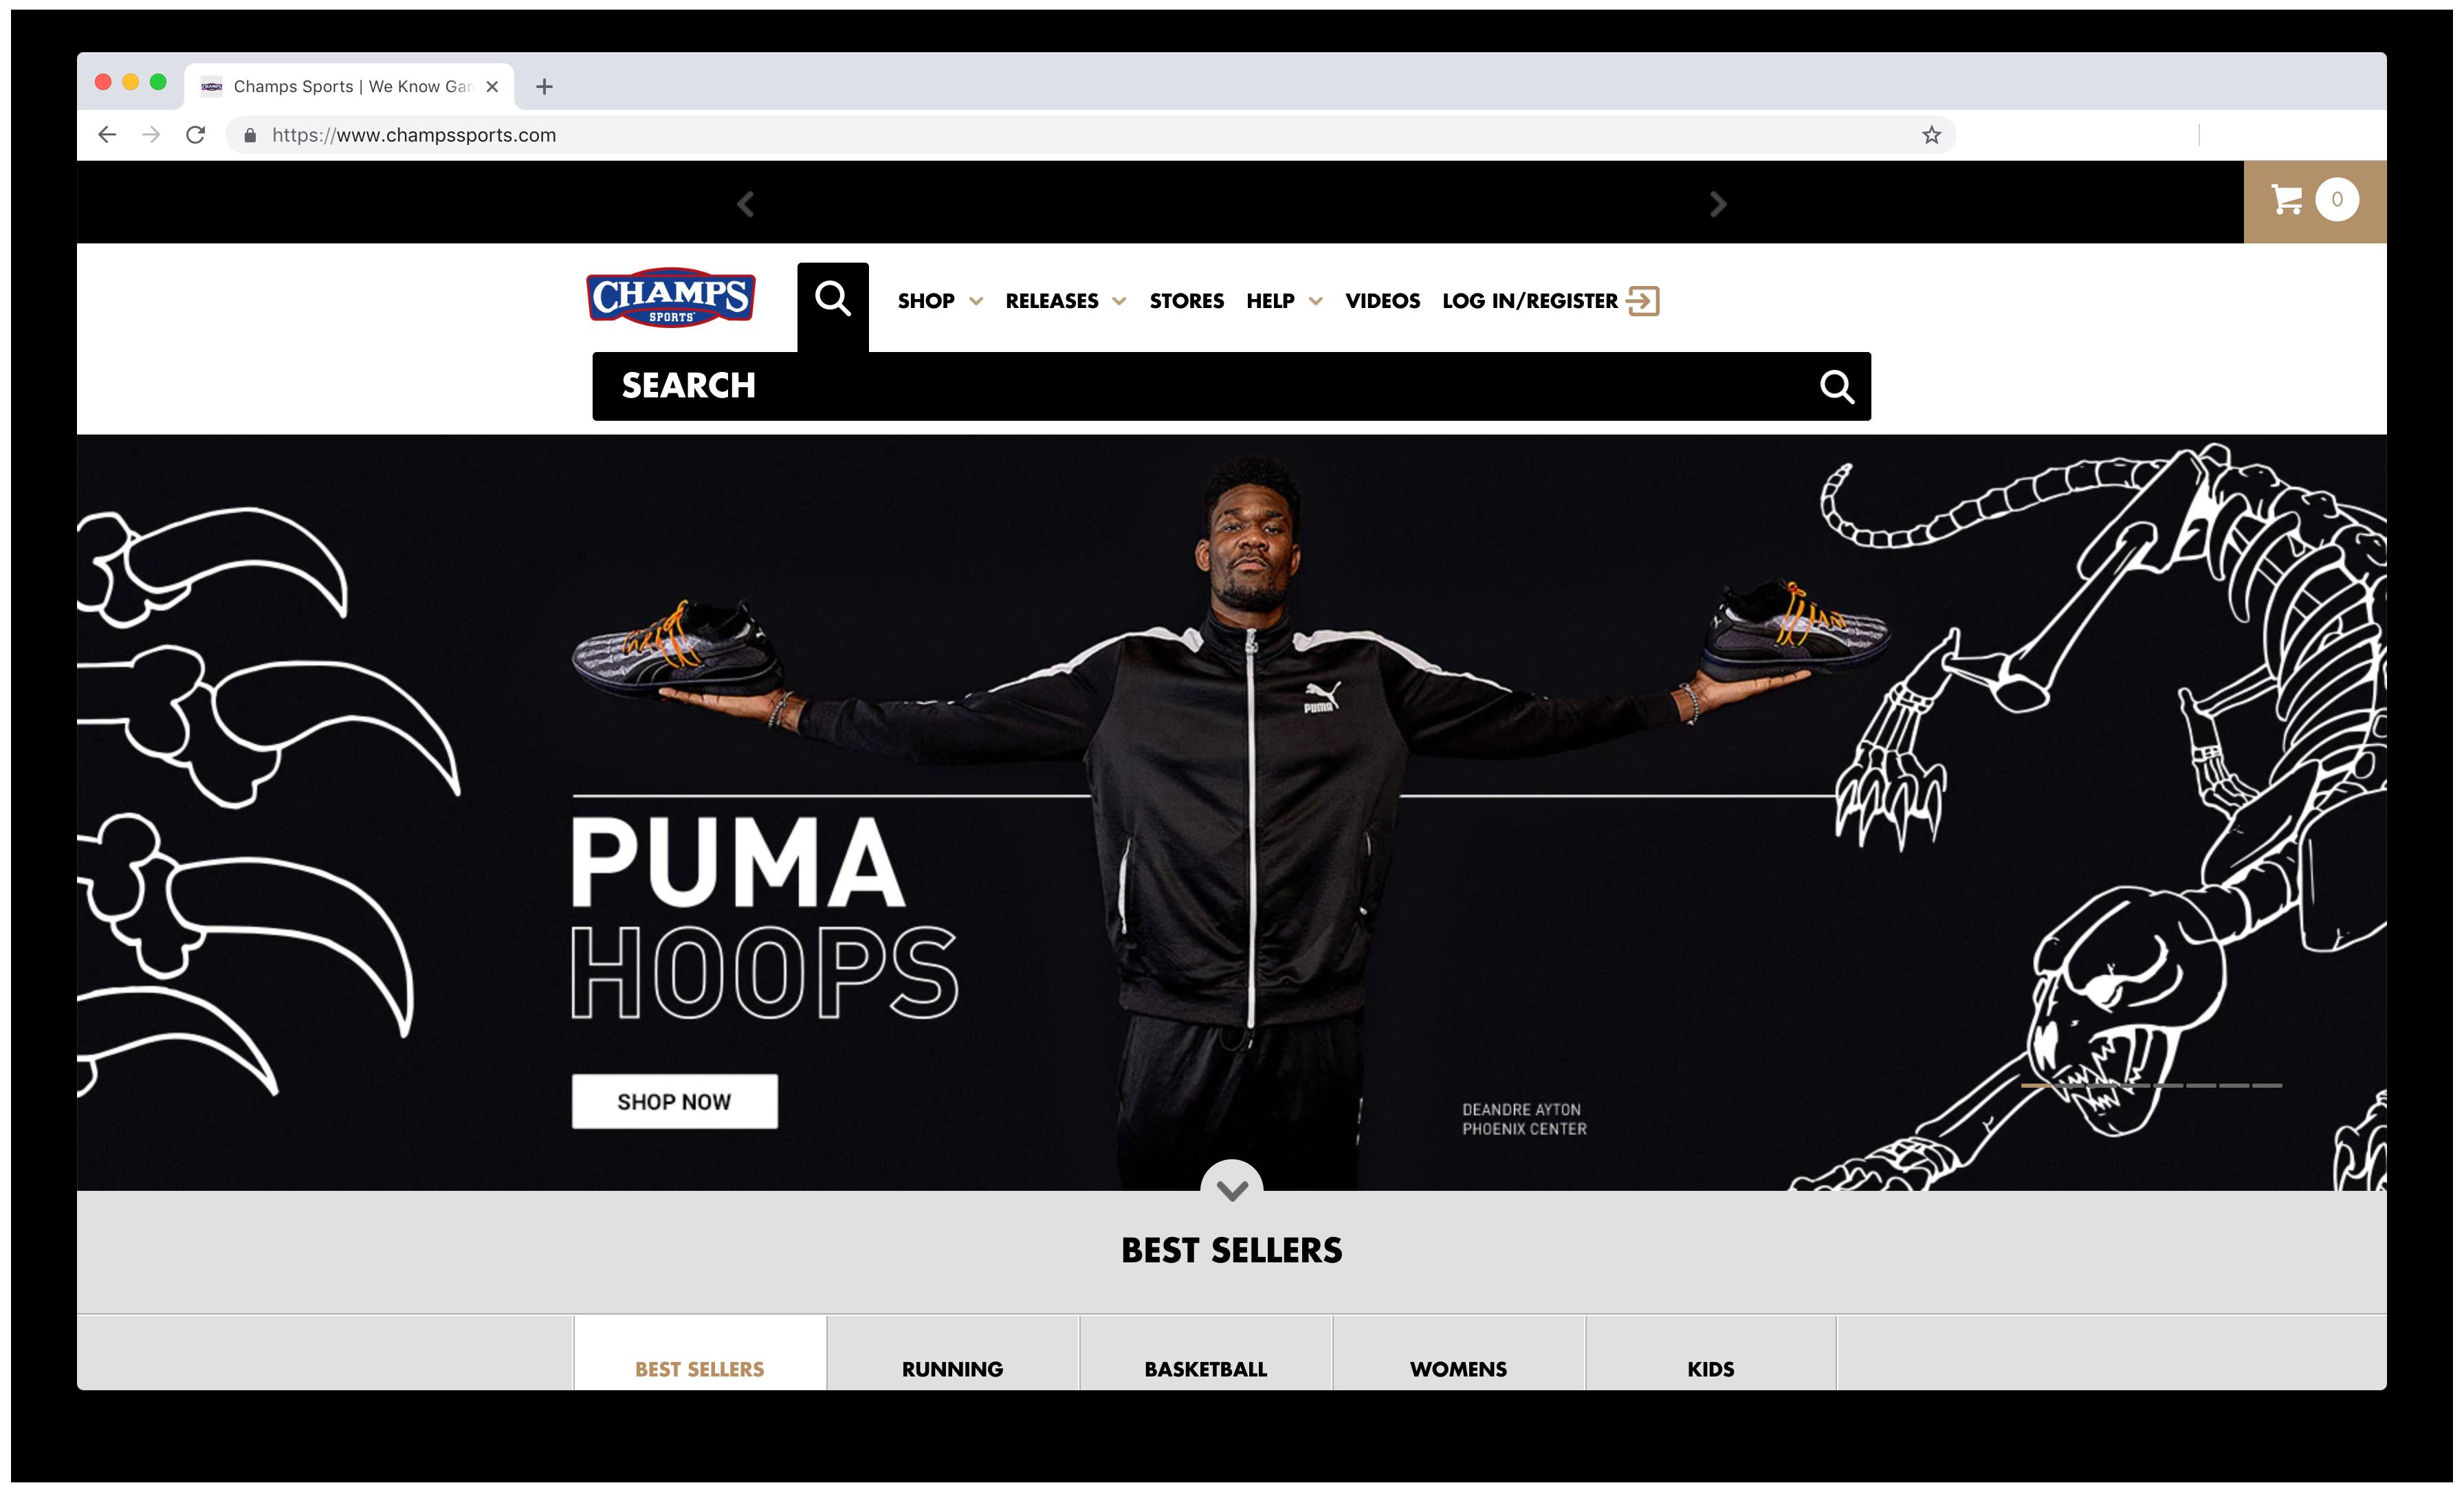 Champs x Puma Hoops Deandre Ayton Website